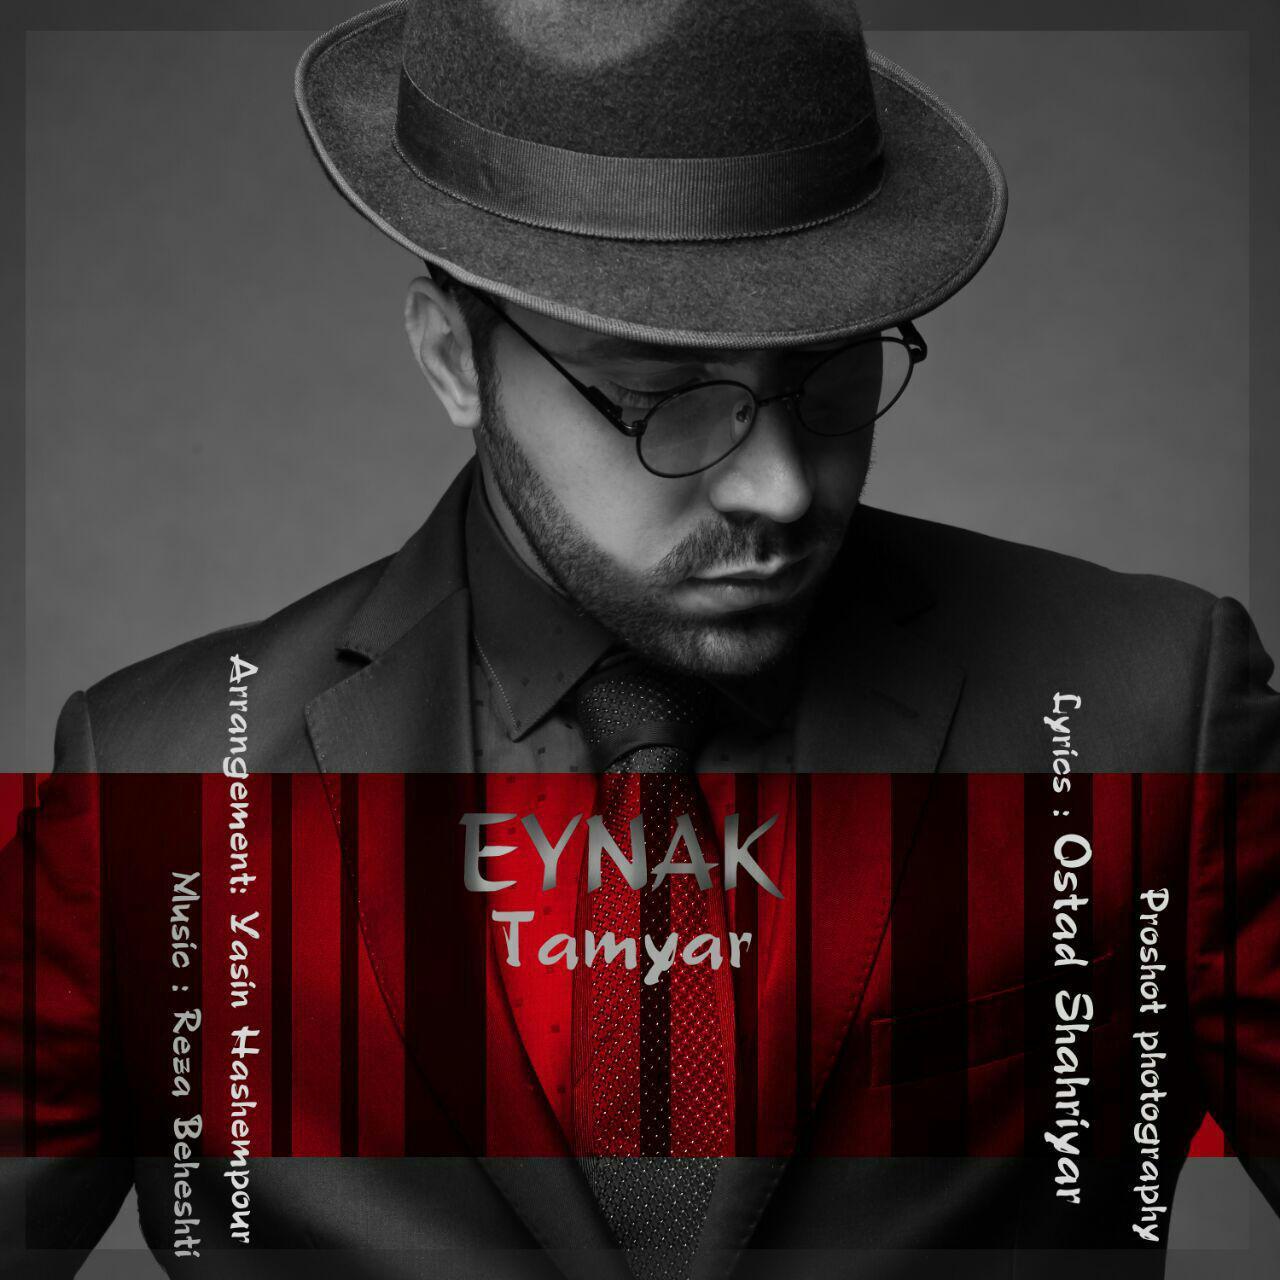 http://s9.picofile.com/file/8300553668/10Tamyar_Eynak.jpg